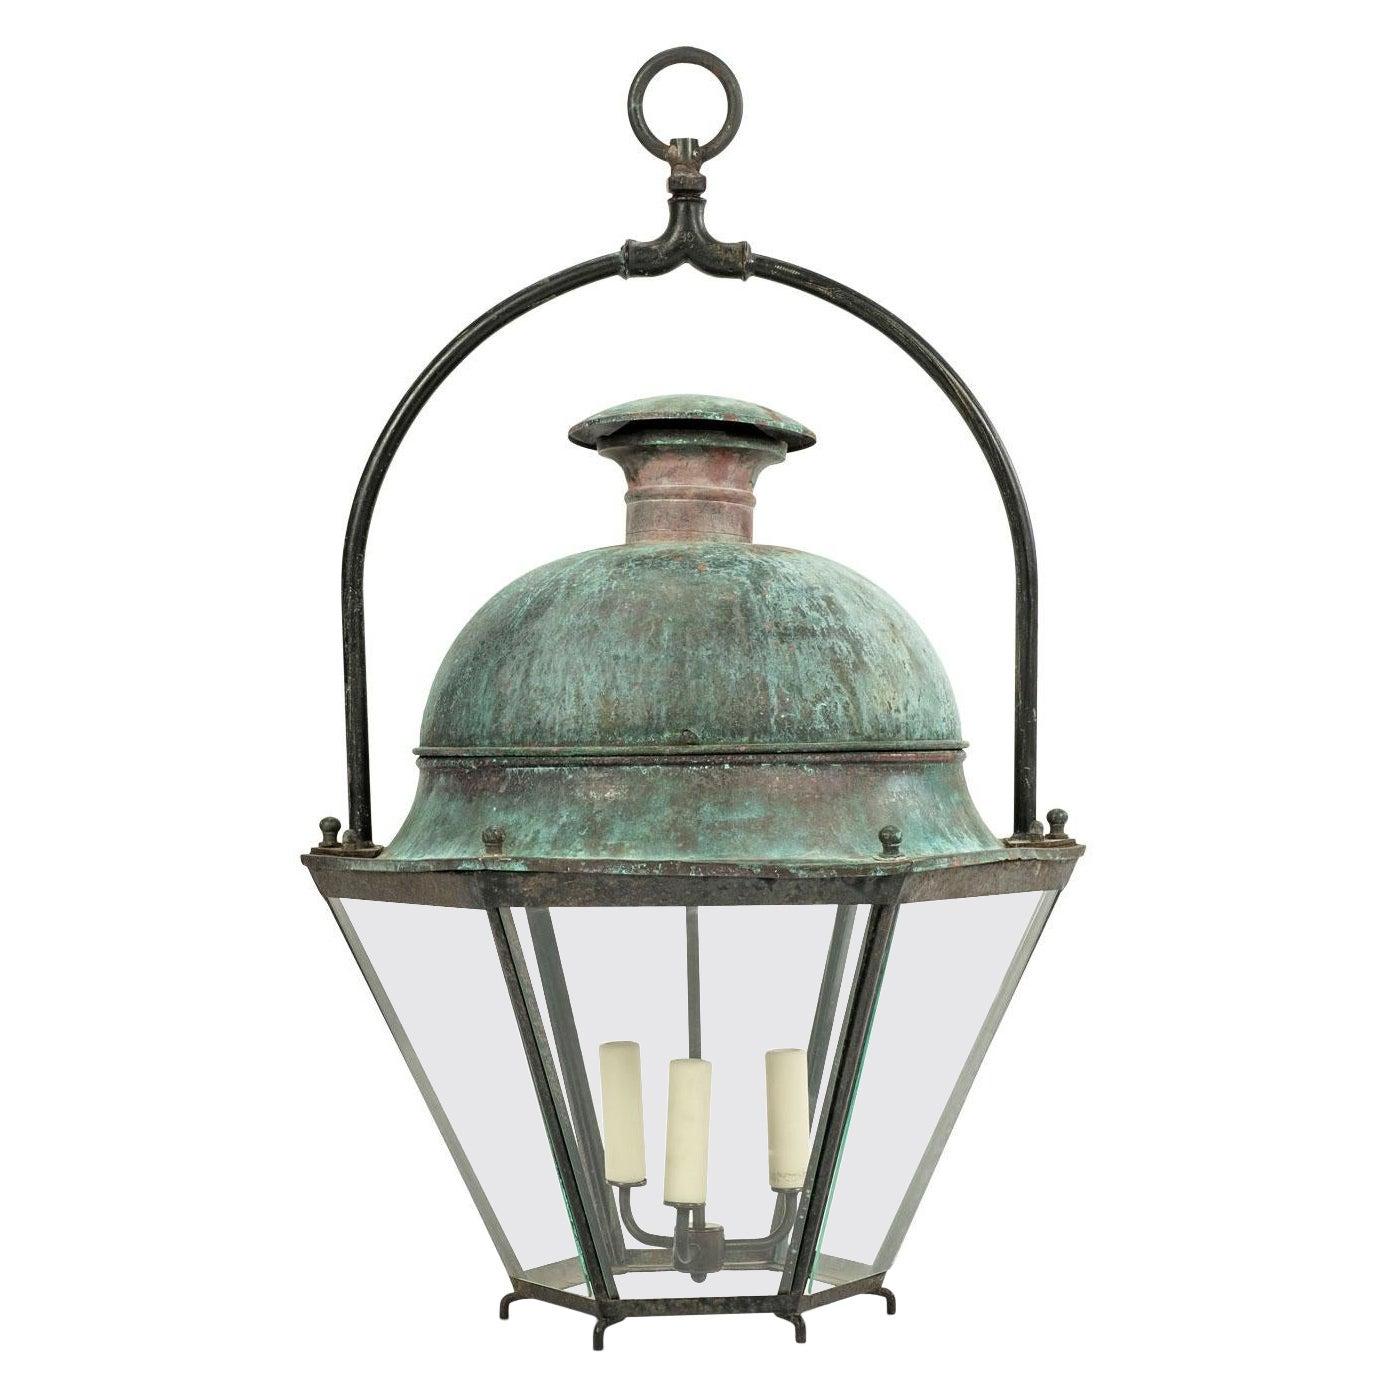 Large French Hexagonal Green-Verdigris Copper Lantern